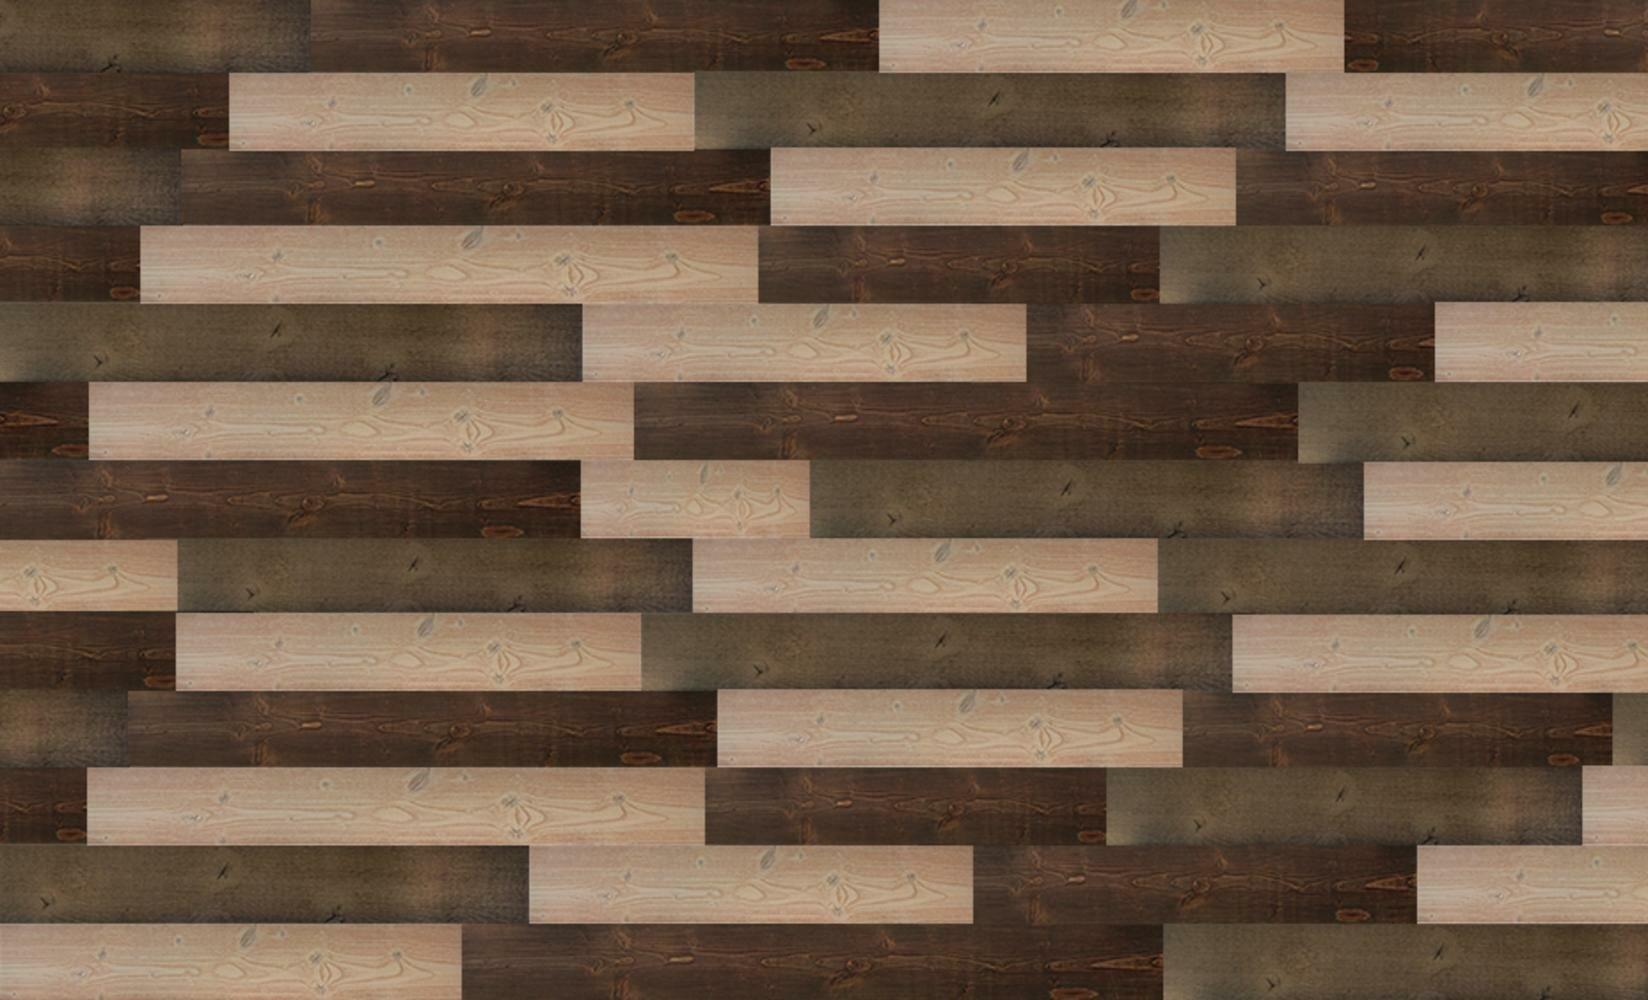 Union Rustic Reclaimed Rustic Wall Planks Self Adhesive Weathered Barn Wood Wall Panels Colour Combination C03c06c08 Wayfair Ca